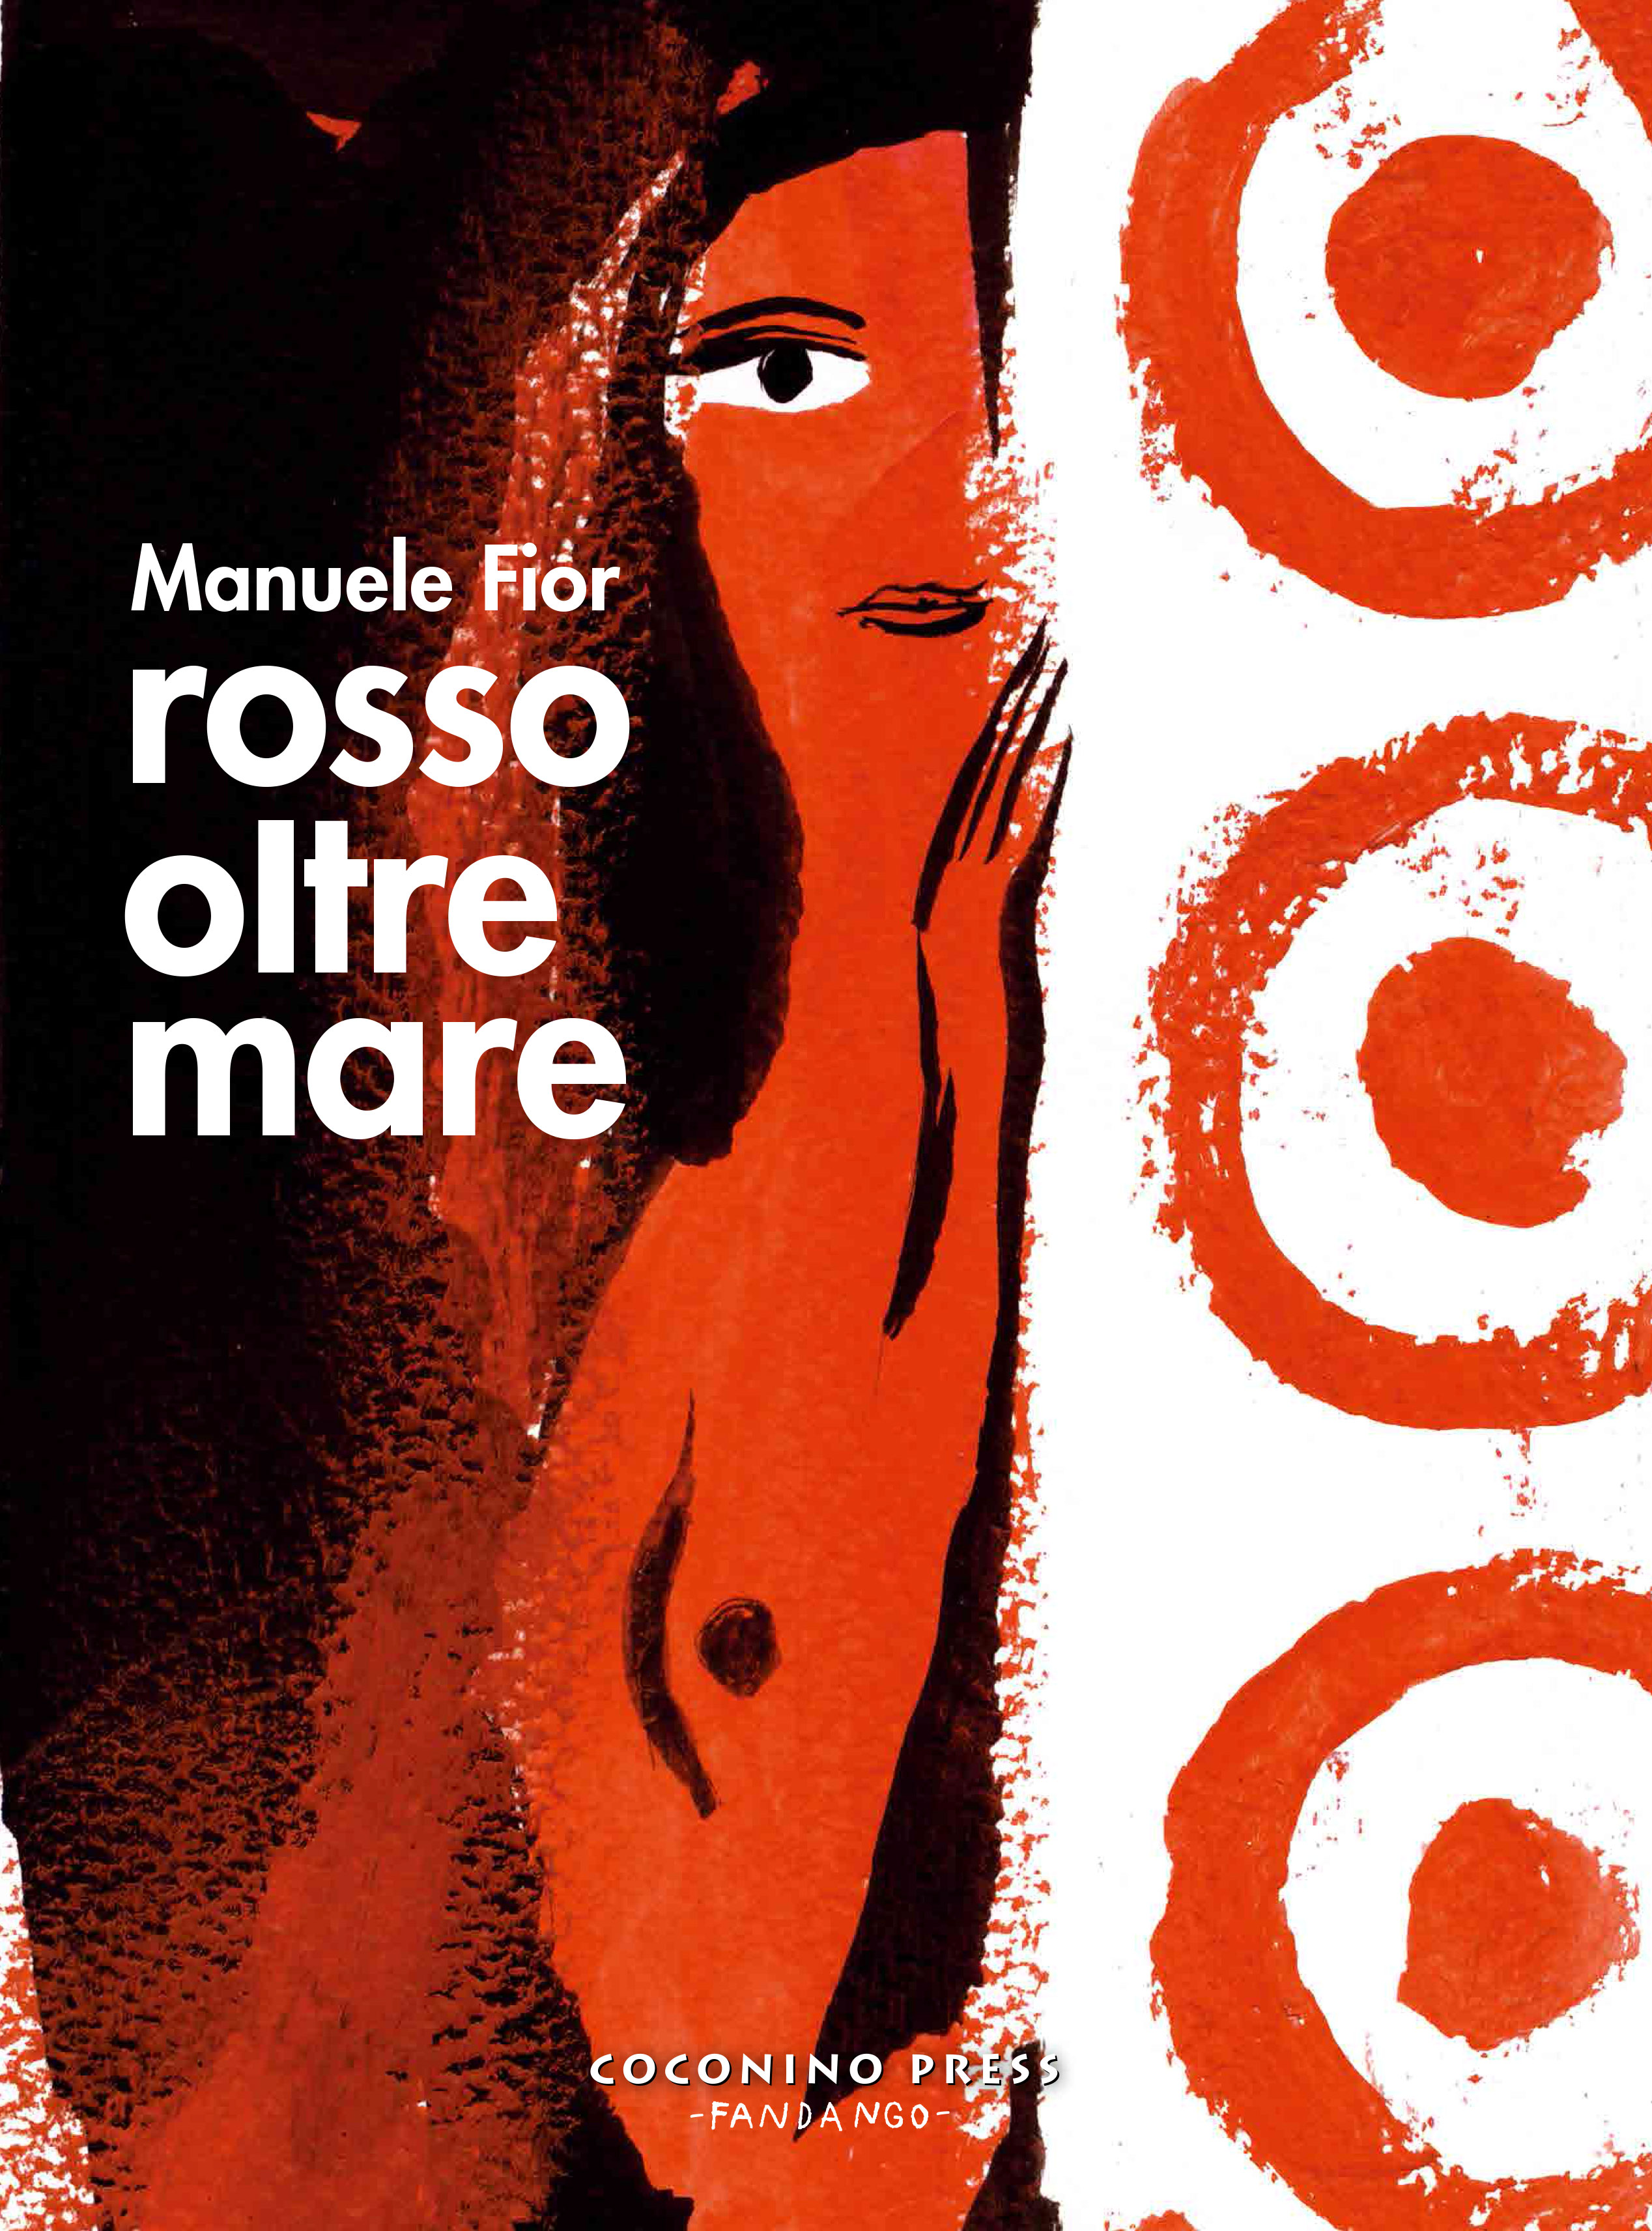 Rosso oltremare (Manuele Fior)